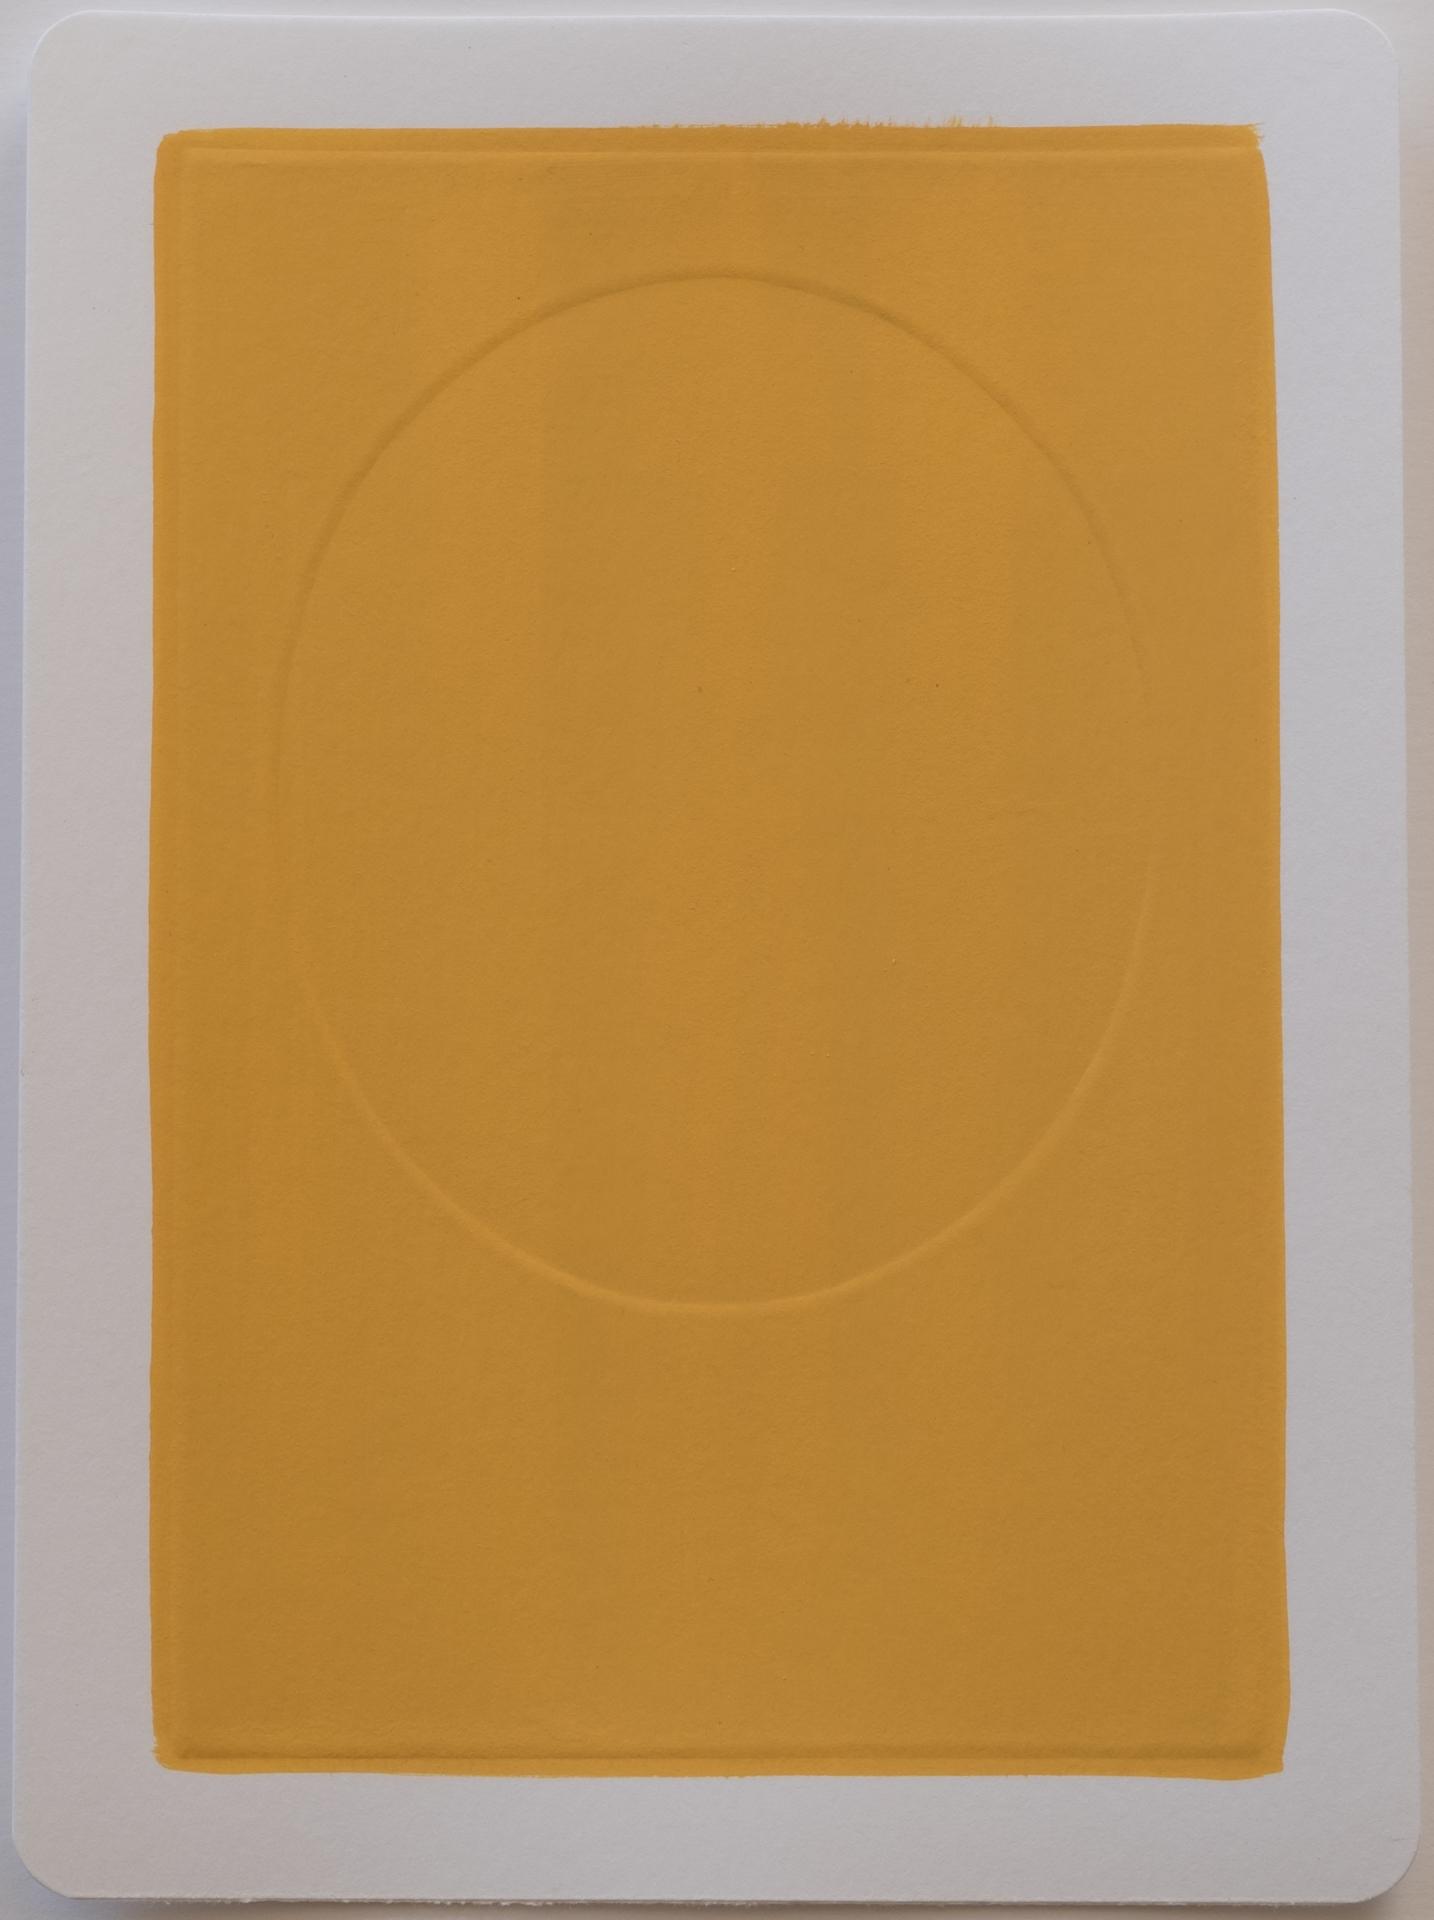 Dali , 2017 Gouache on dry embossed paper 18 x 25 cm